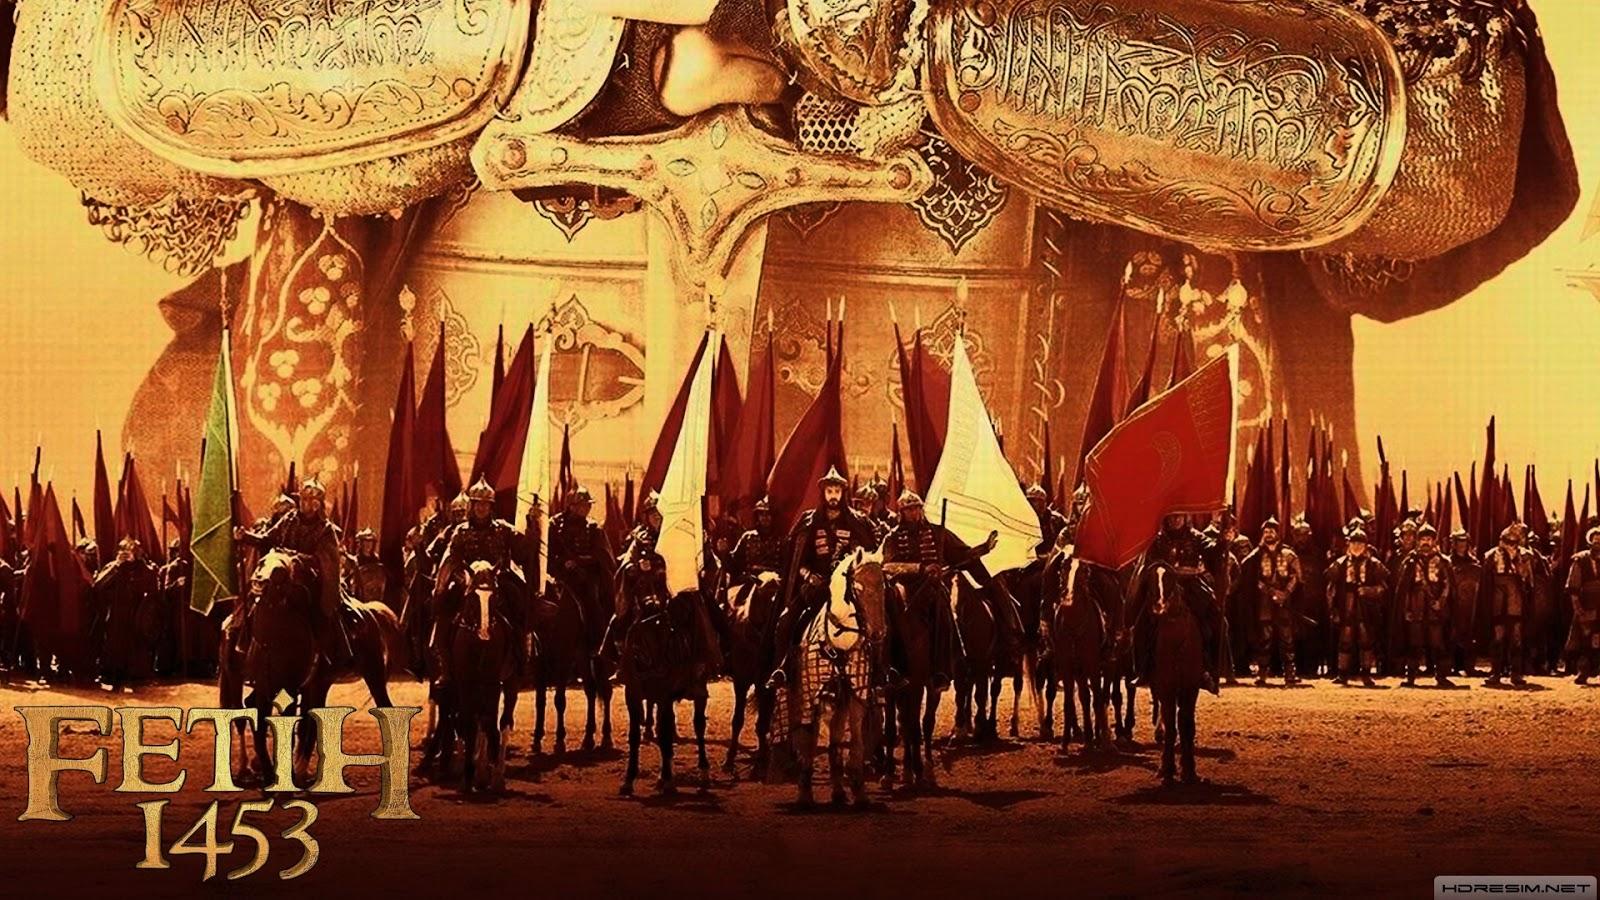 Derajat Hadits Pembukaan Konstantinopel dan Sultan Al Fatih bimbingan islam